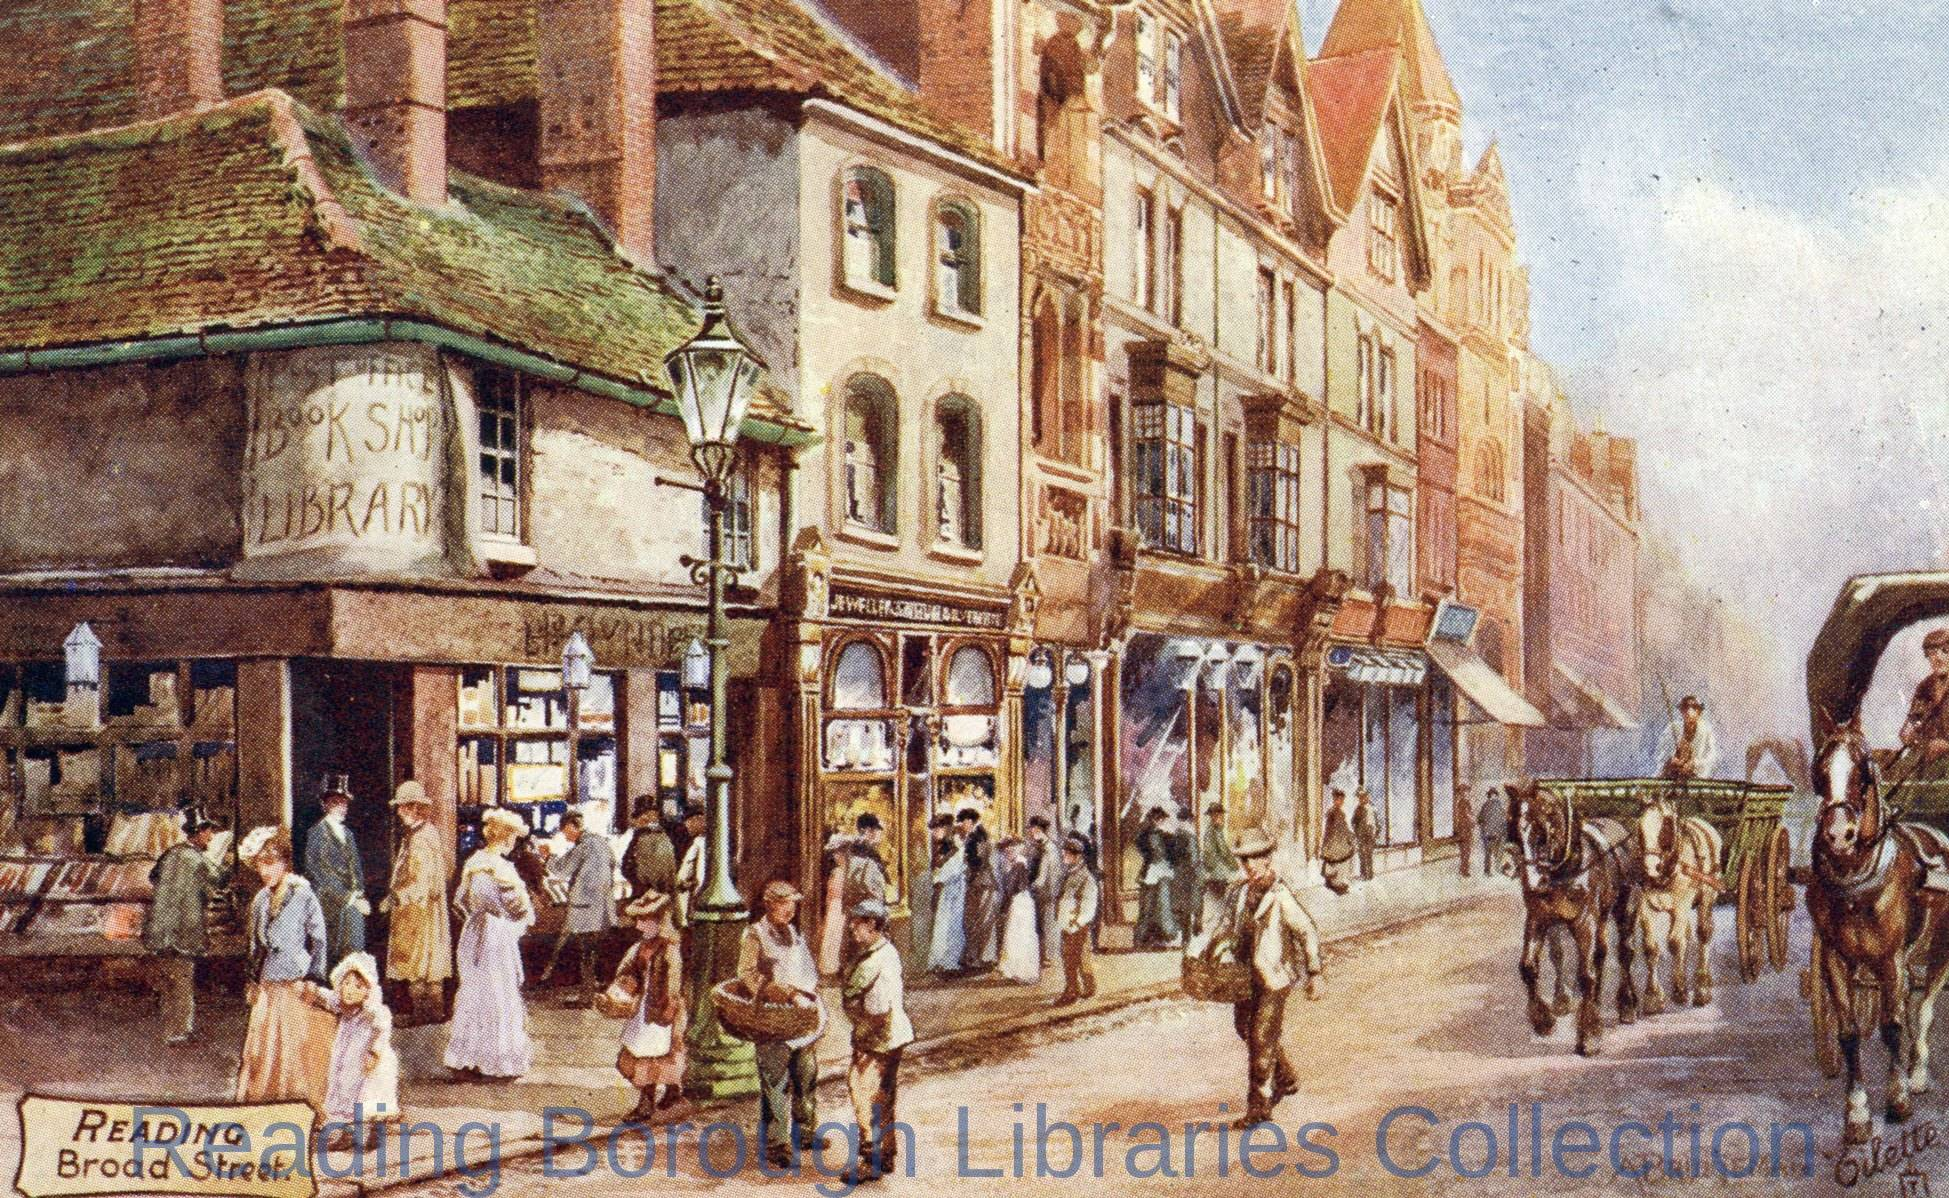 Broad Street, Reading.